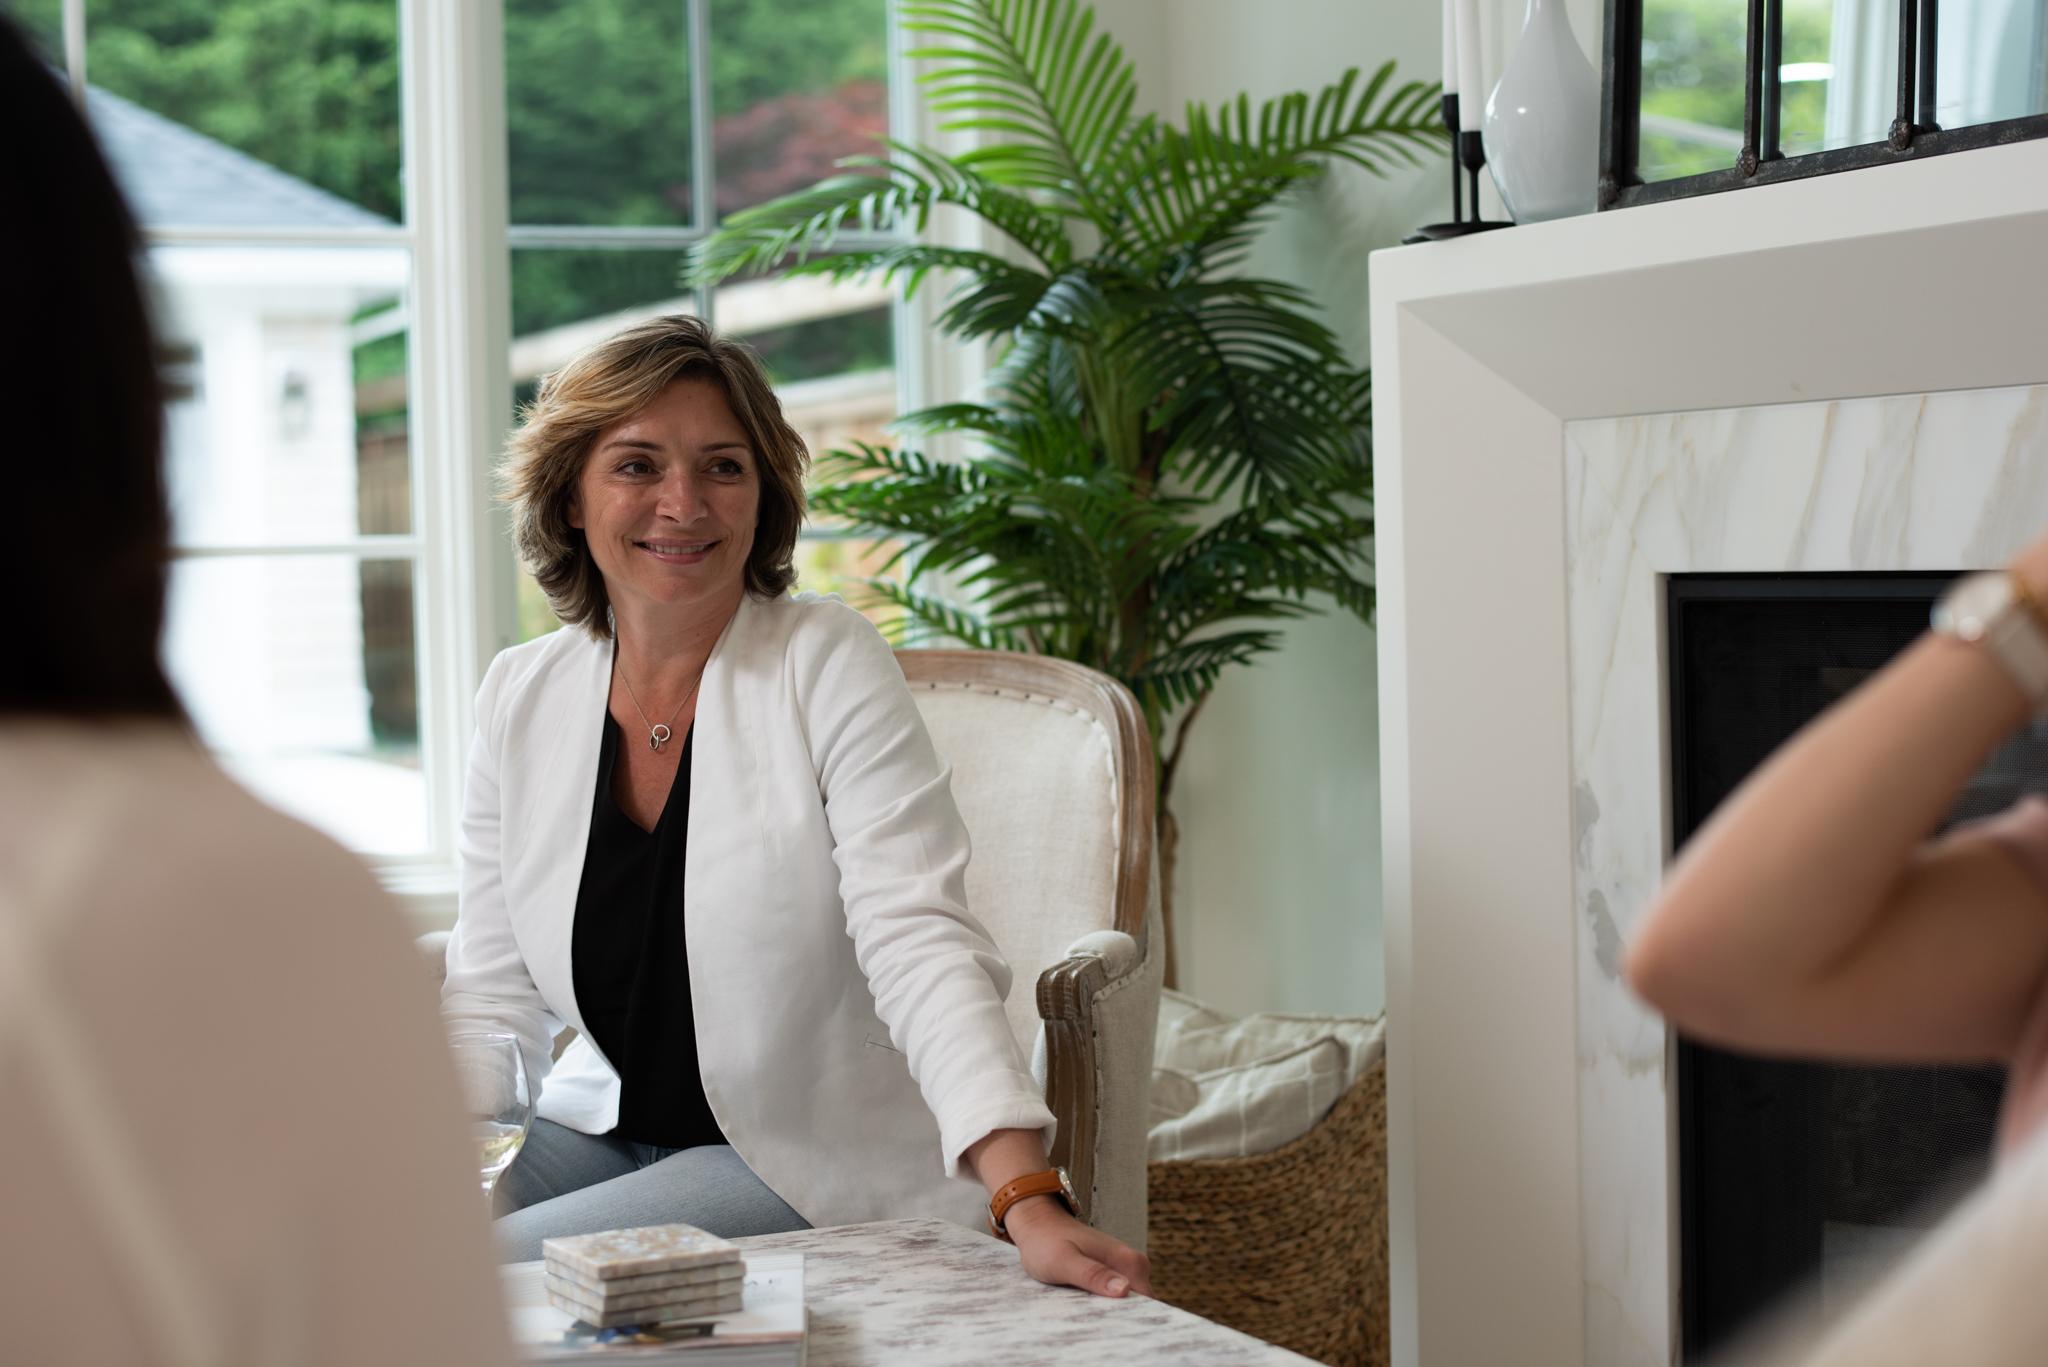 Nancy working